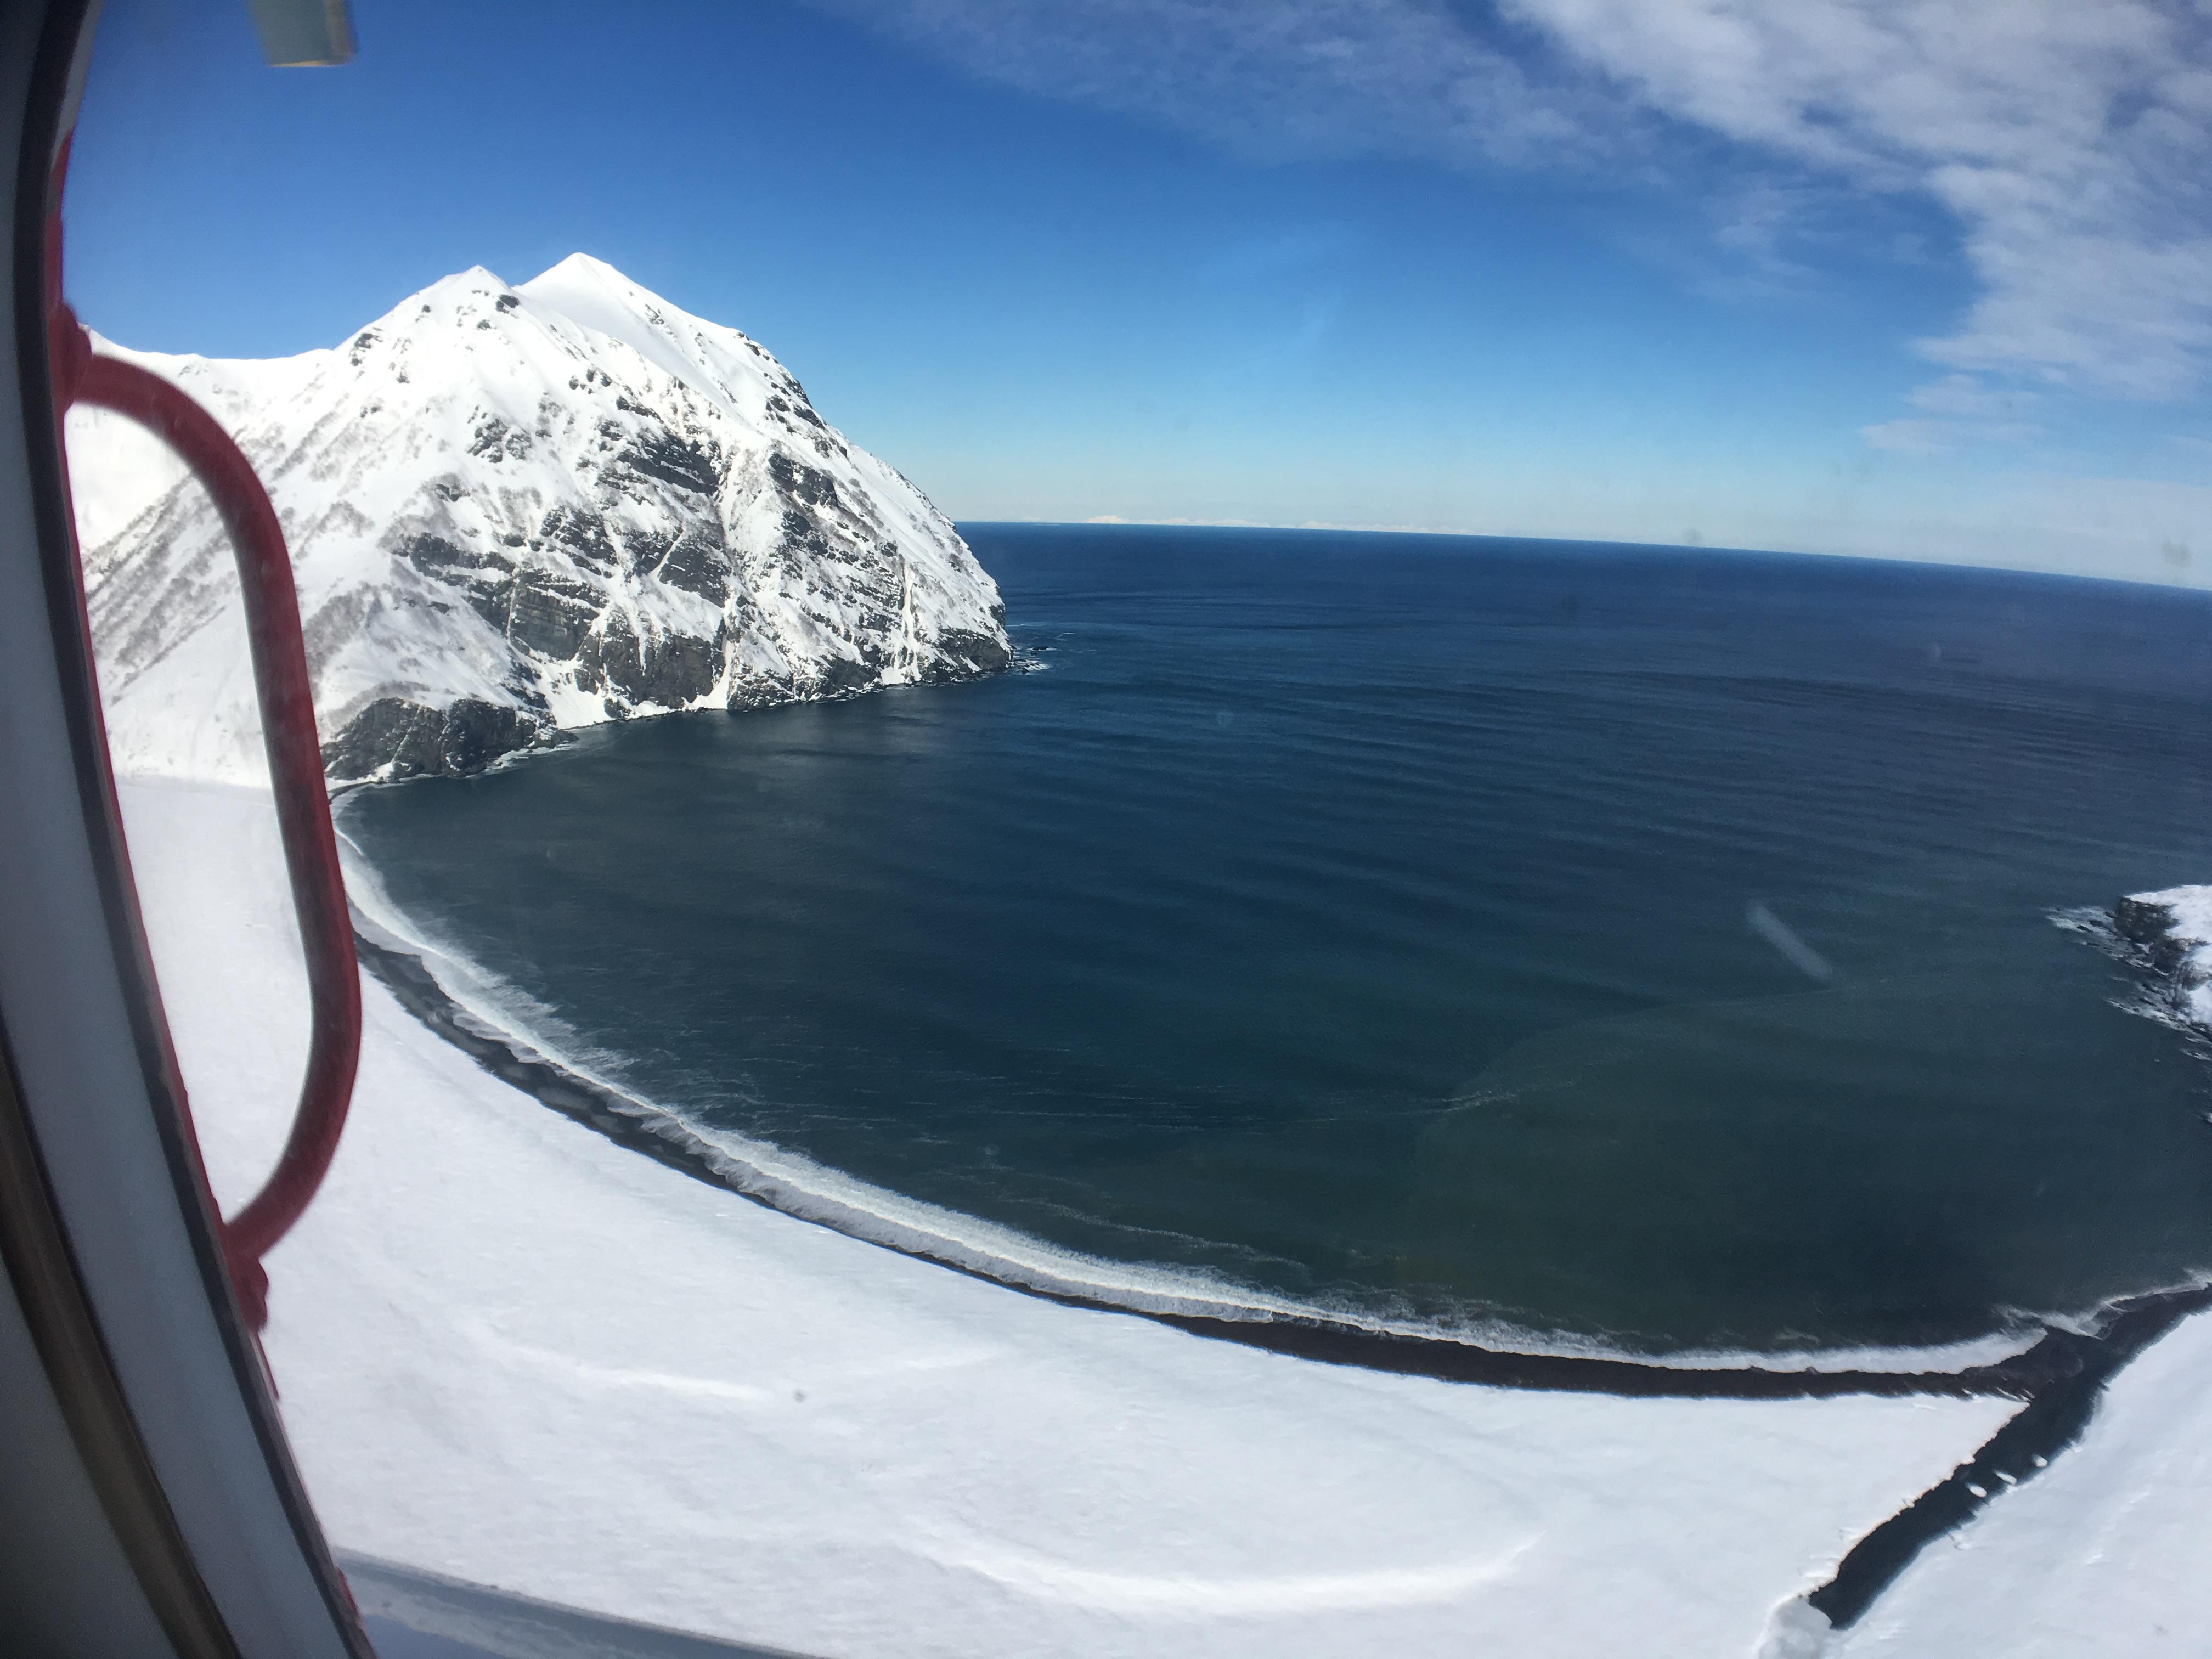 mountain guides, ifmga, uiagm,